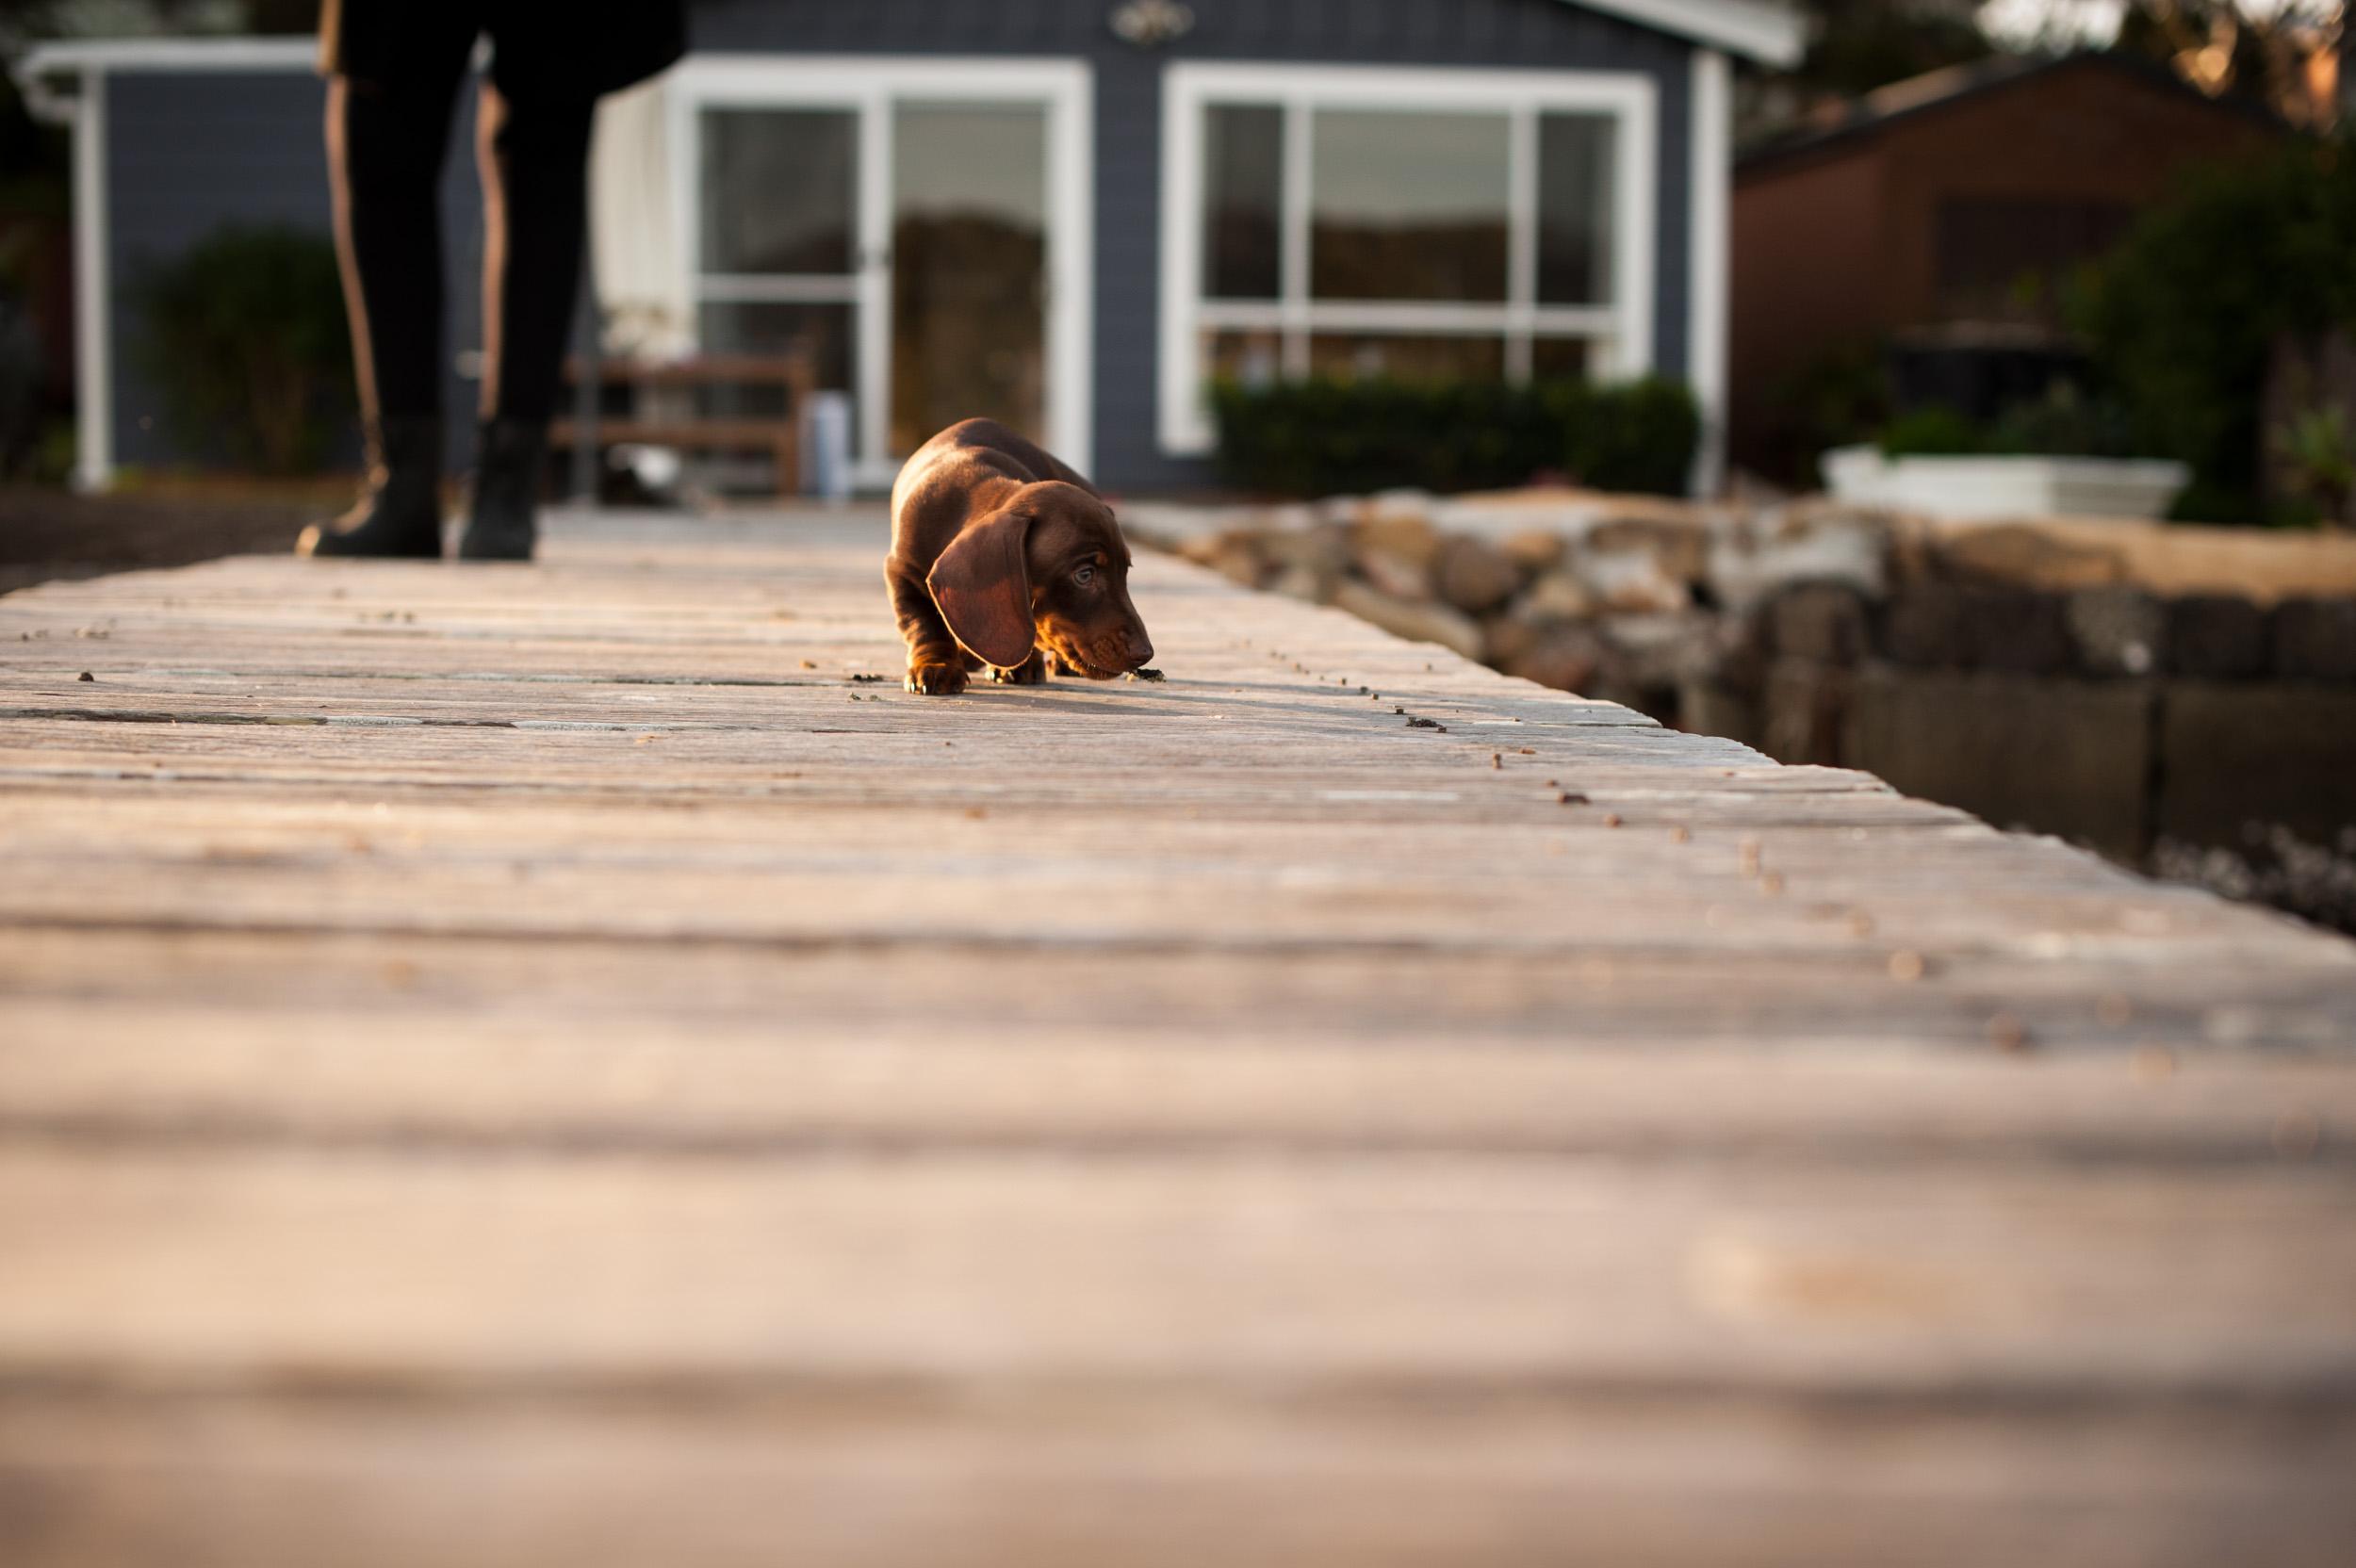 Sausage dog walking on a jetty